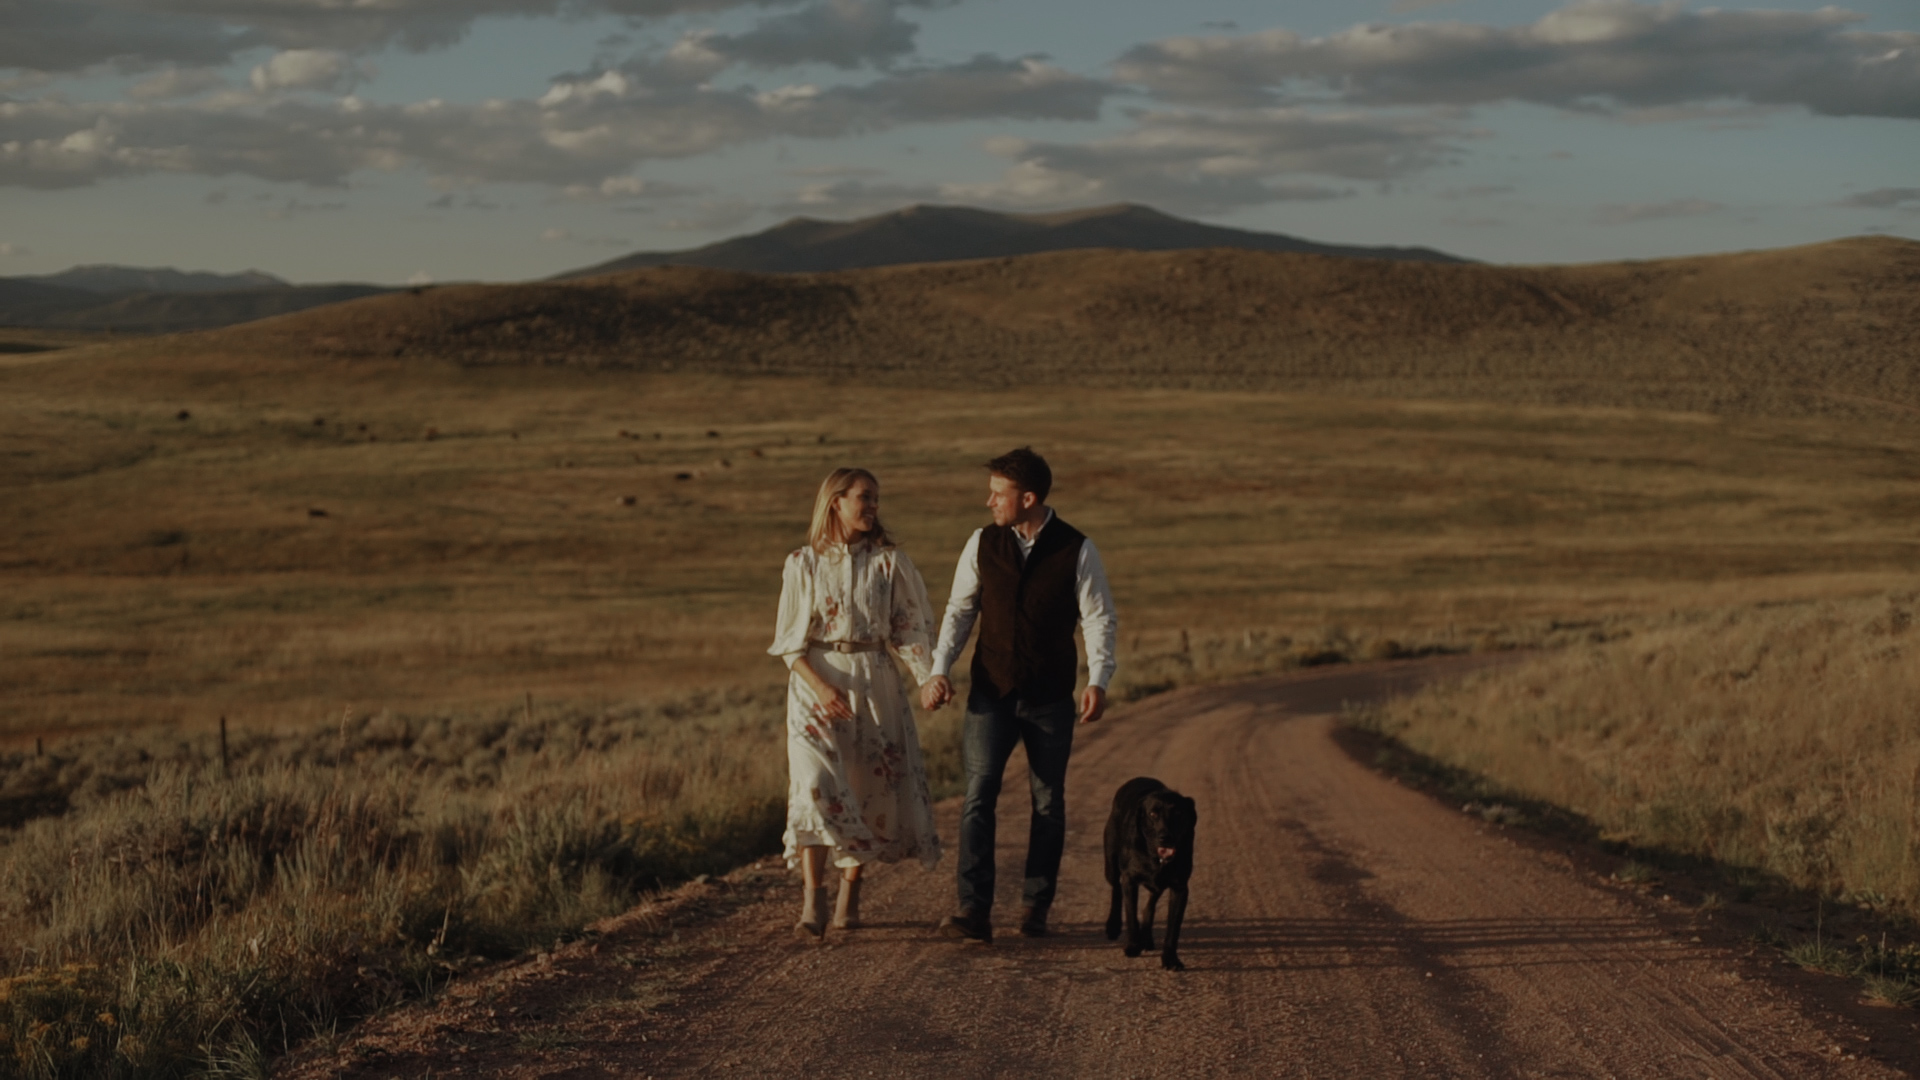 Meredith + Ryan   Saratoga, Wyoming   The Lodge & Spa at Brush Creek Ranch